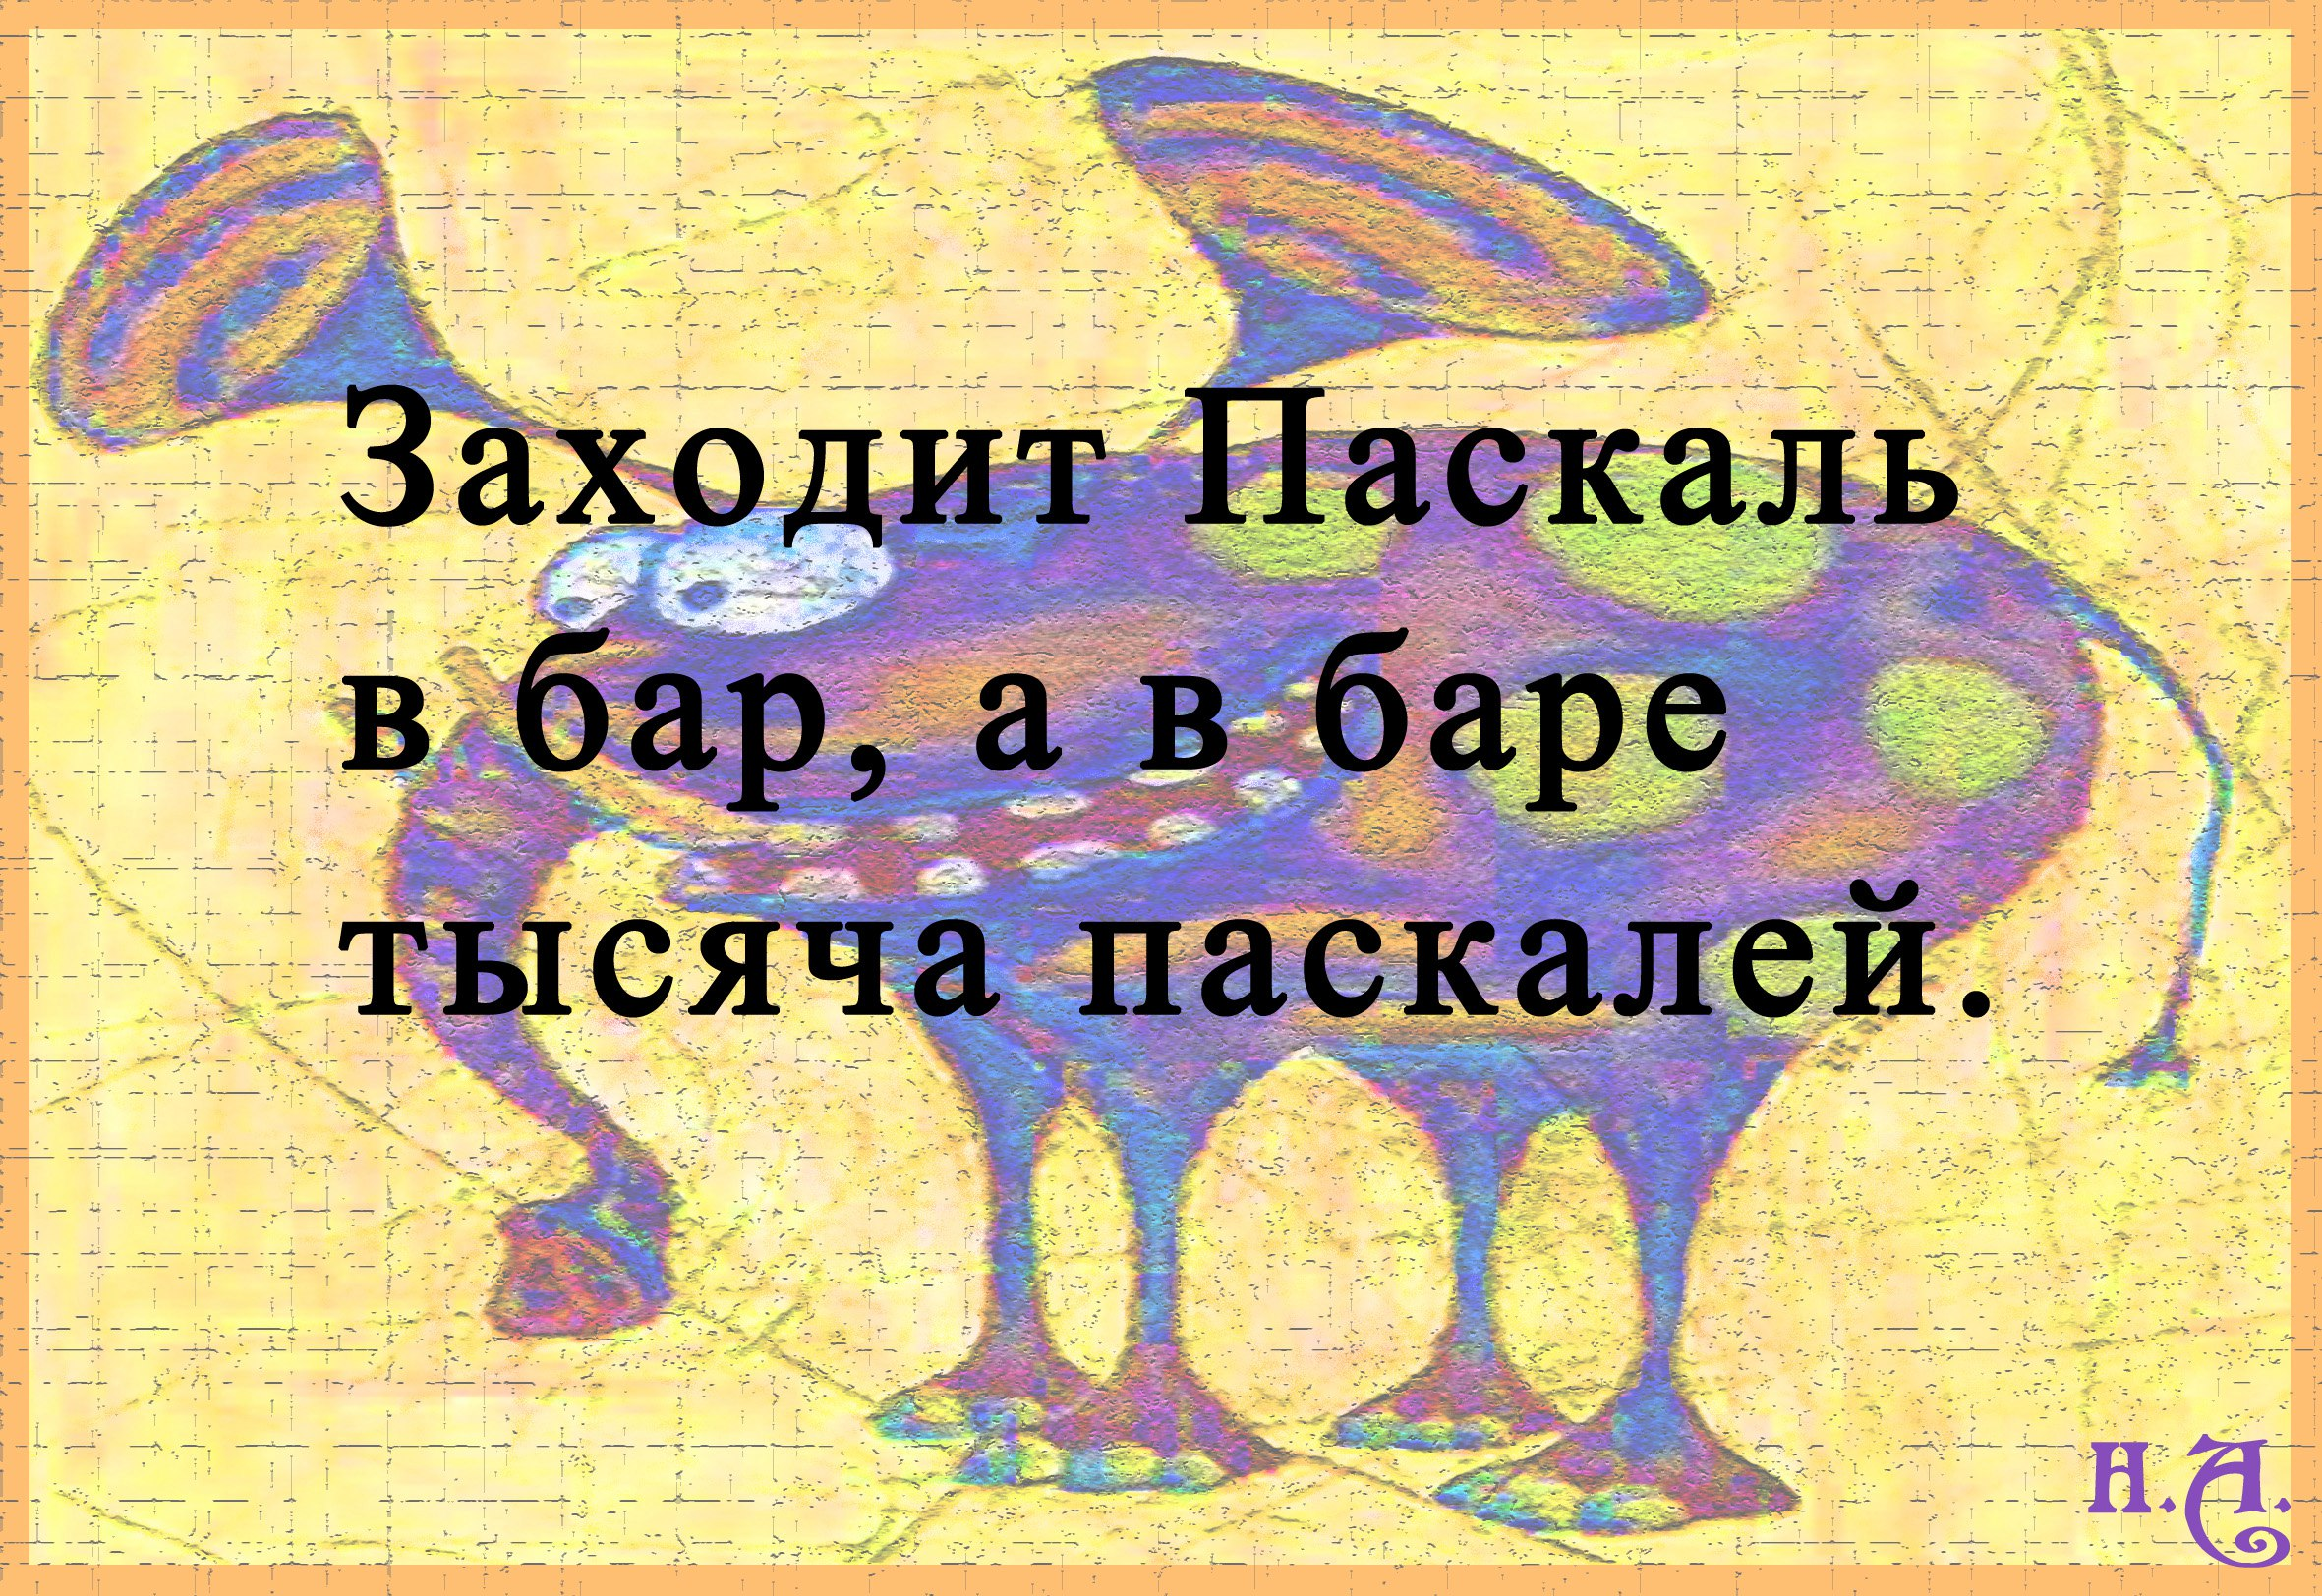 e-bdQ5VKWzs.jpg